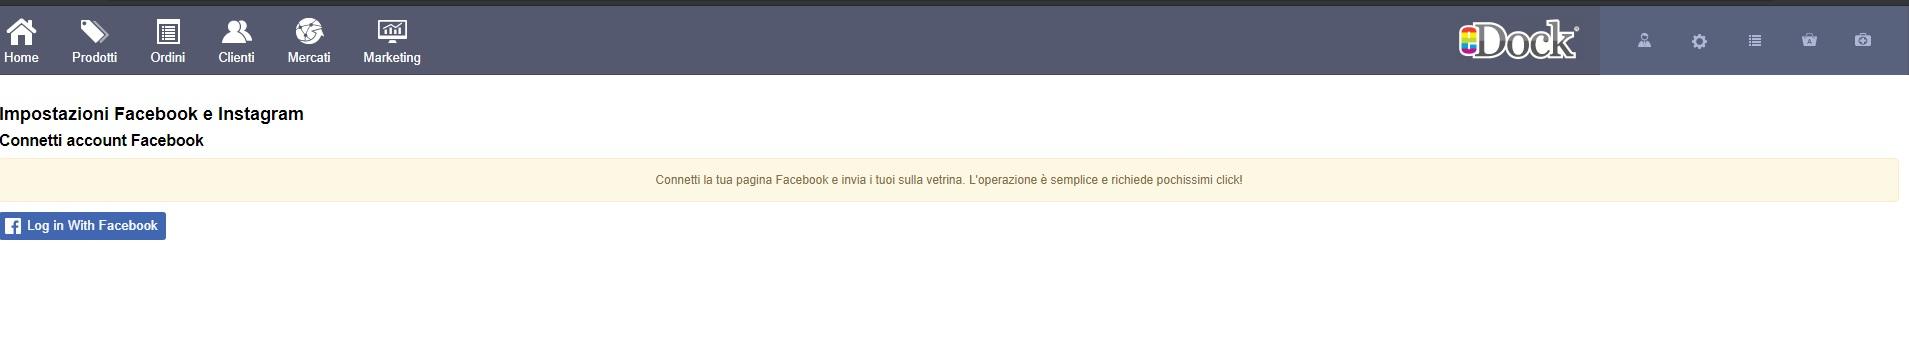 impostazione facebook opc